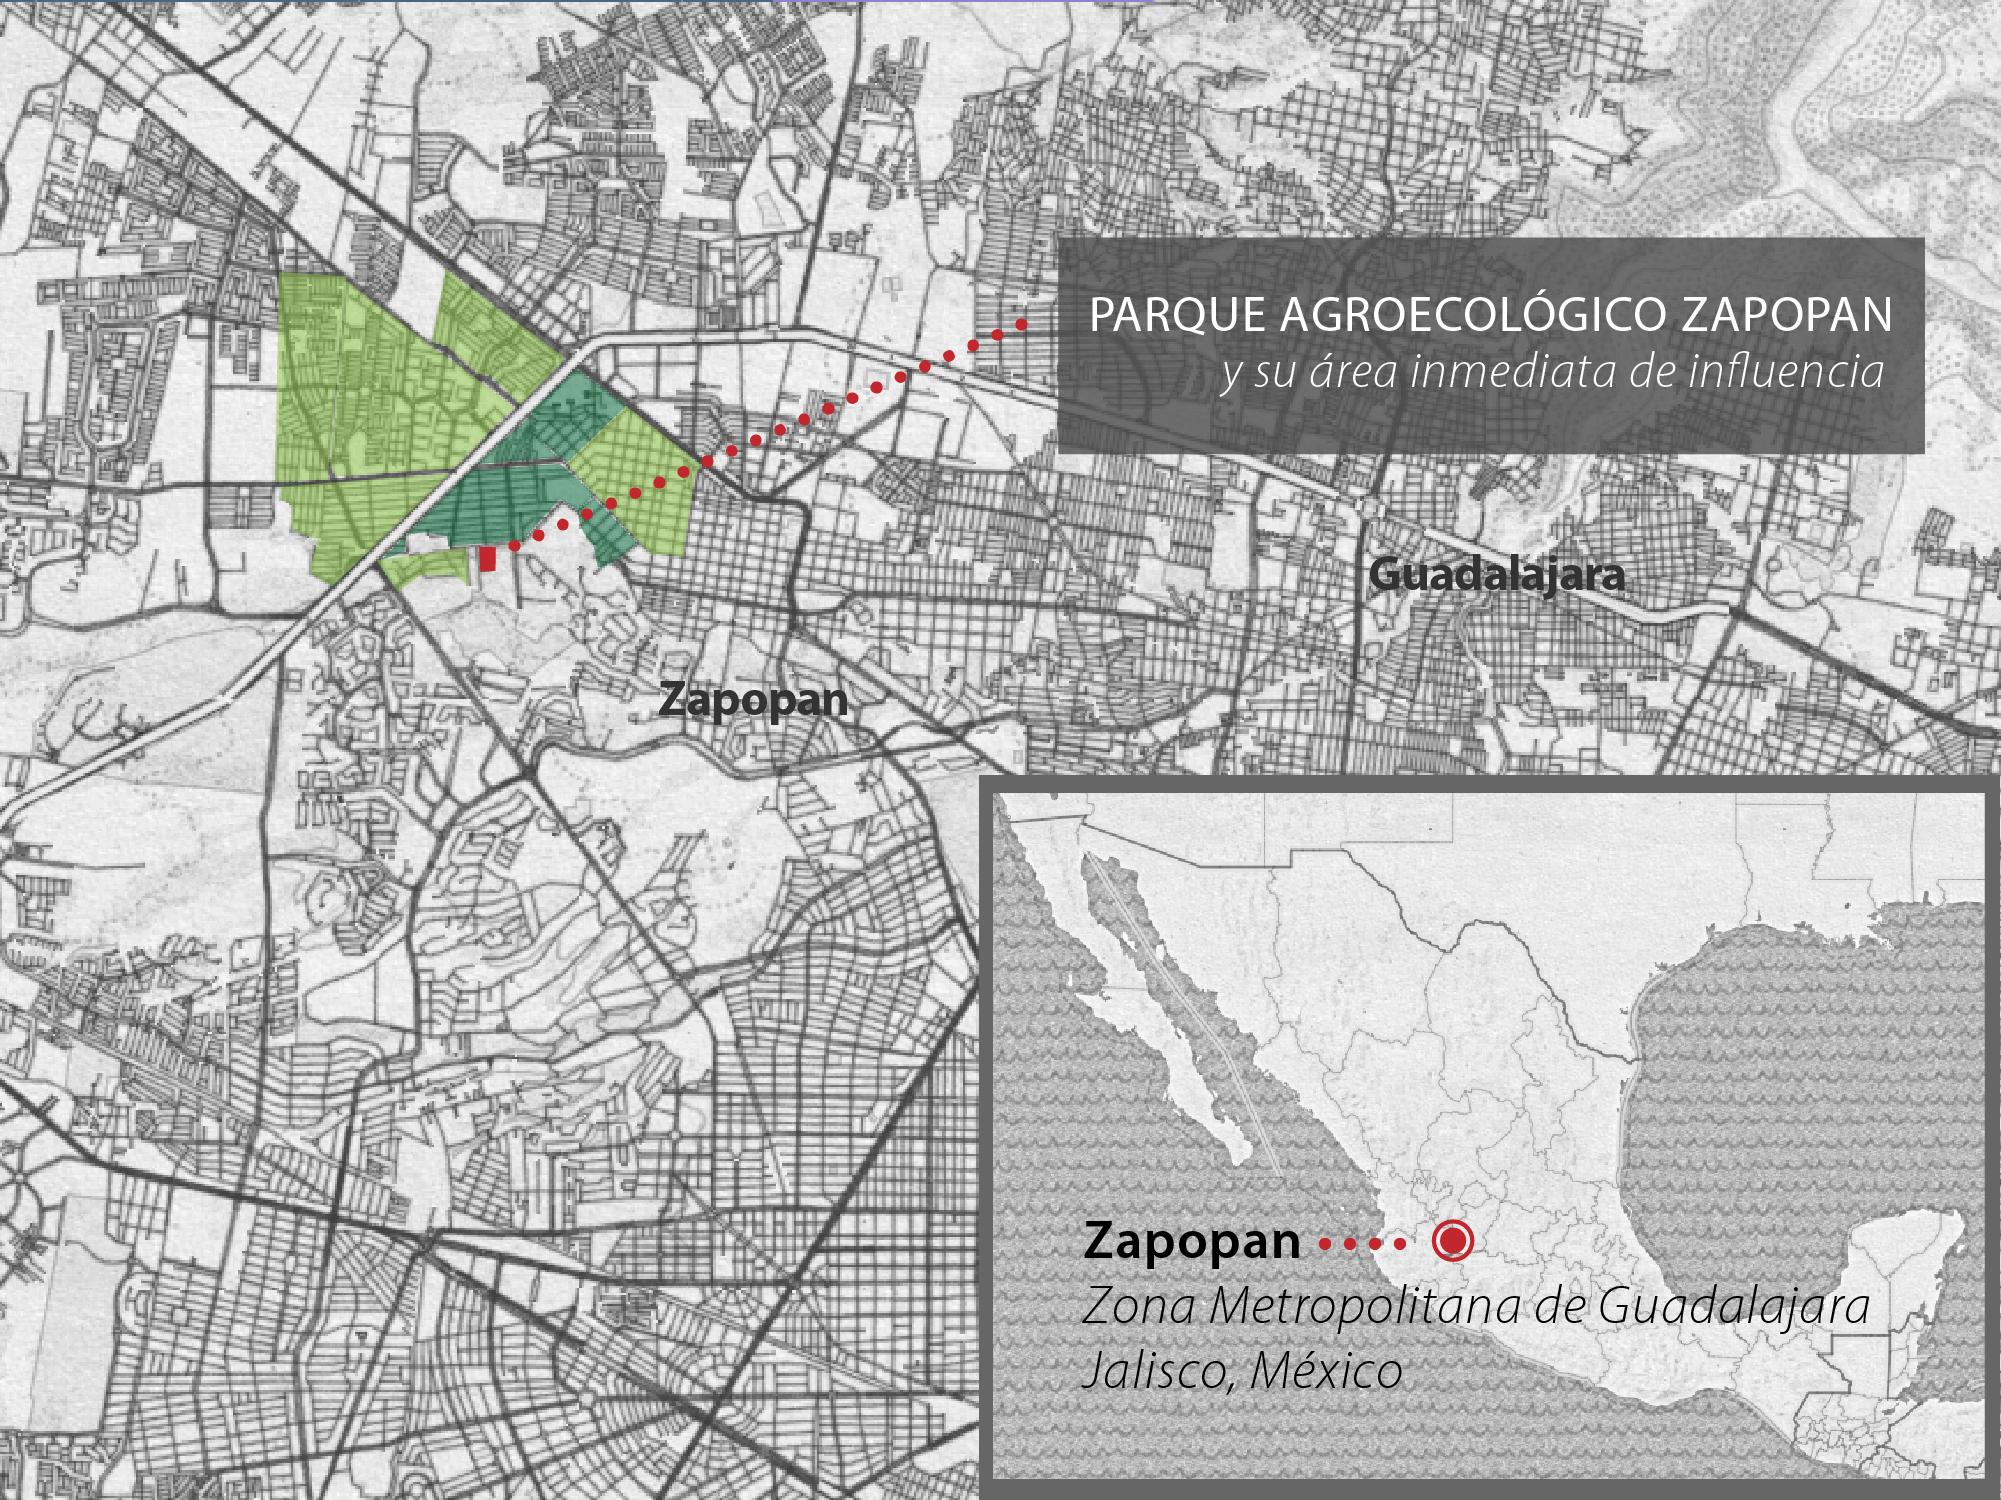 ubicación parque agroecológico zapopan.jpg